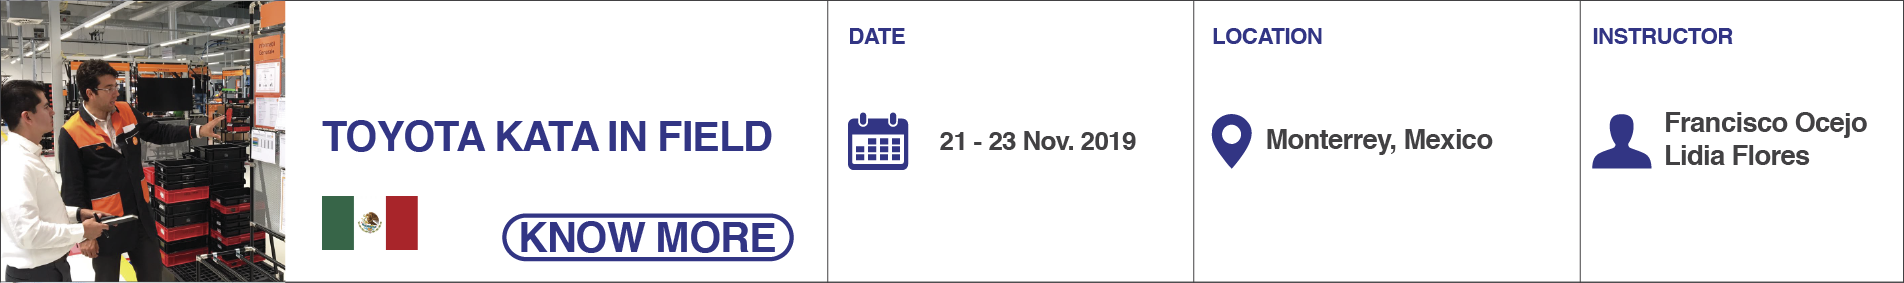 calendar-alfra-1-14